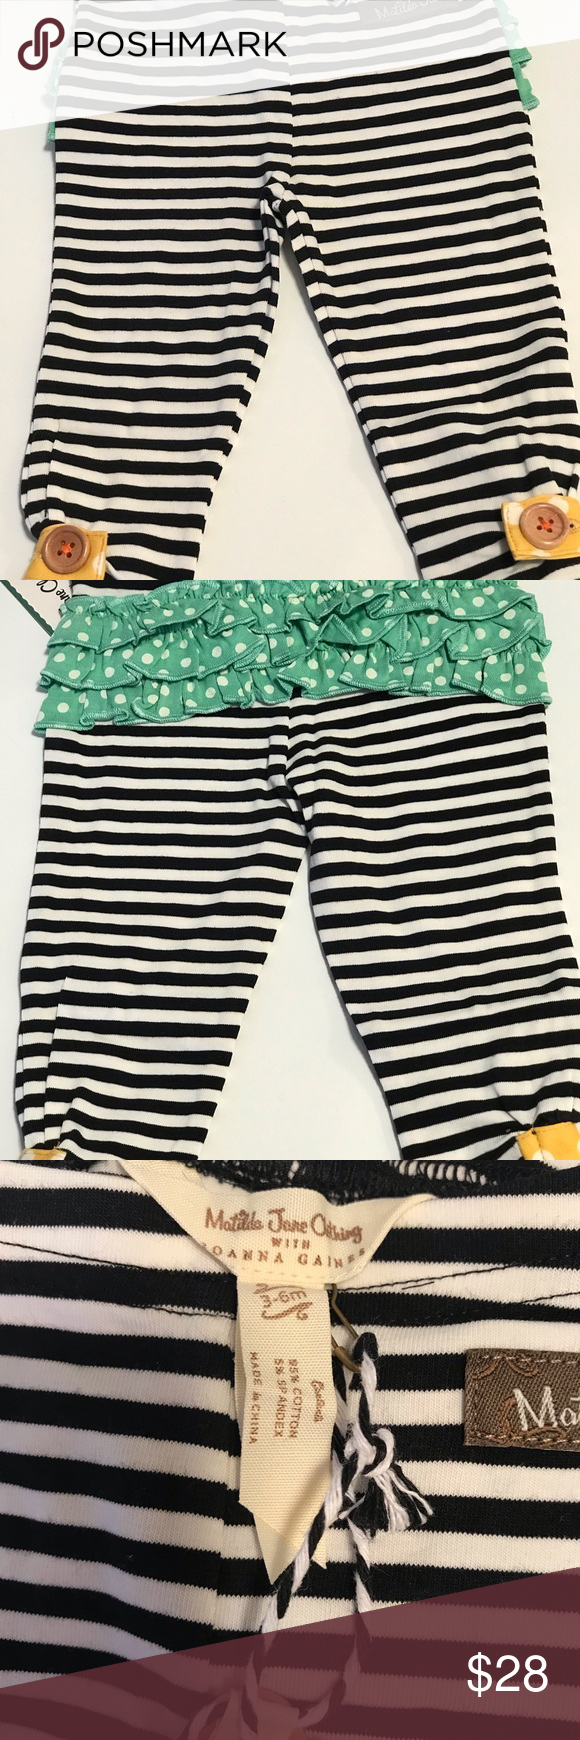 a5258c78ce9d7 Matilda Jane duckling leggings New with tags. Matilda Jane duckling leggings.  Teal & black. 95% cotton 5% spandex Matilda Jane Bottoms Leggings